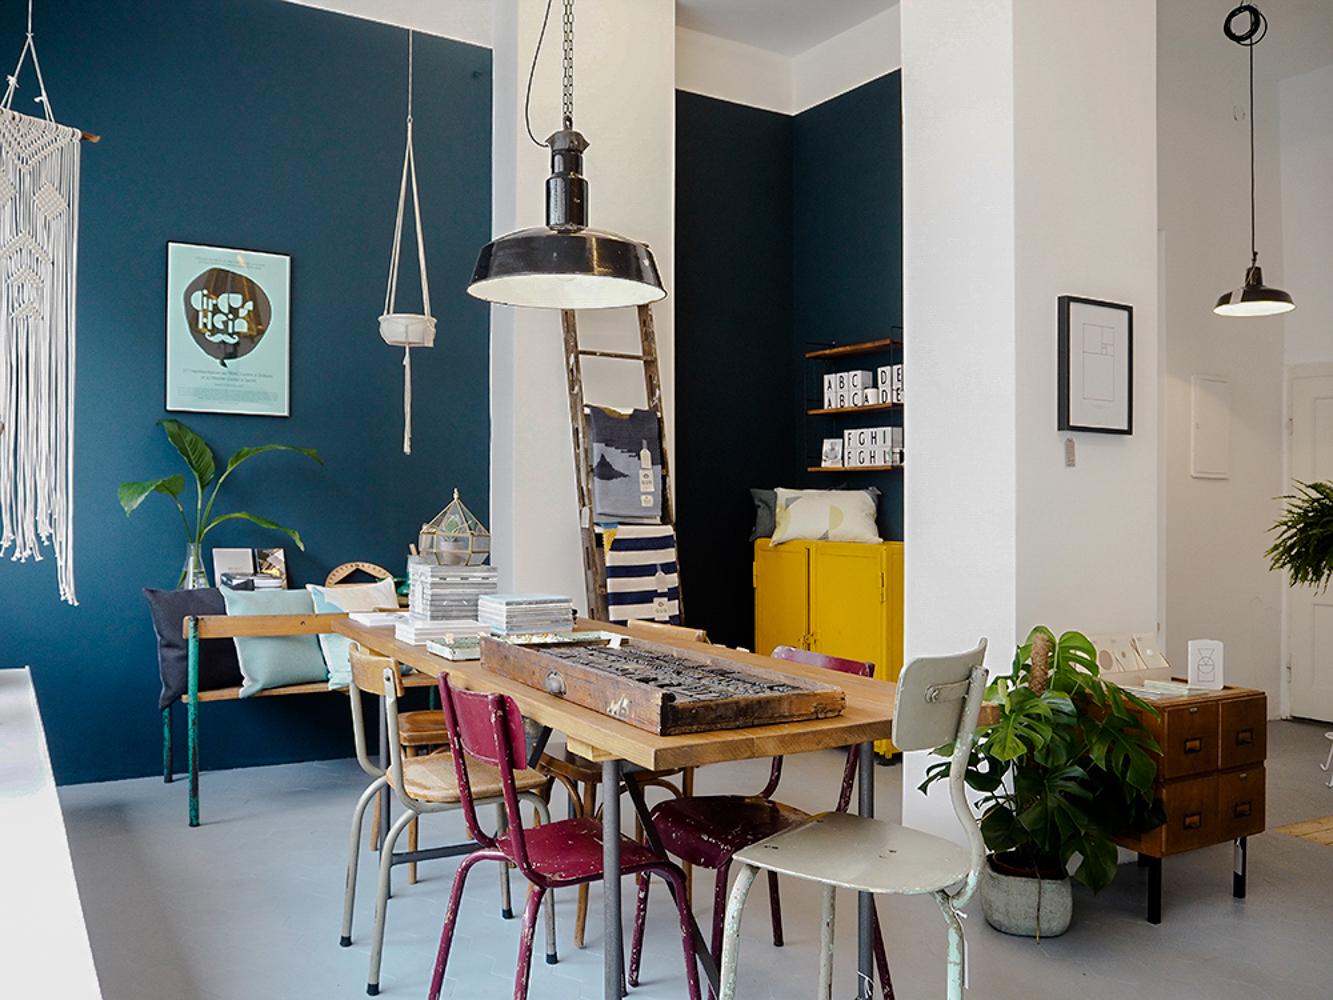 blautne wandfarbe amazing andere schn hellblau wandfarbe berall fr optische andere hellblau. Black Bedroom Furniture Sets. Home Design Ideas